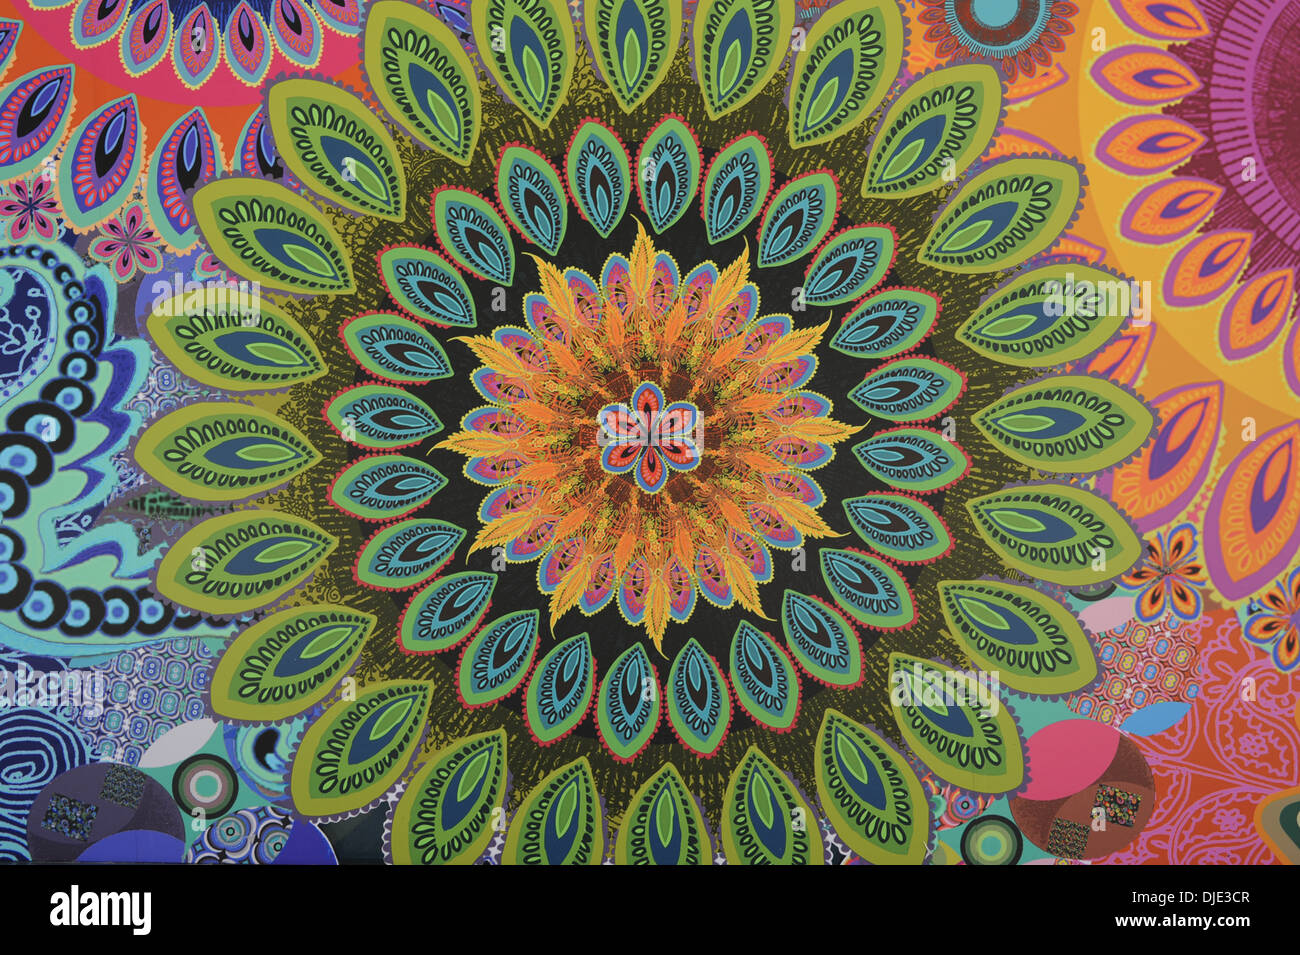 Colorful Mosaic - Stock Image